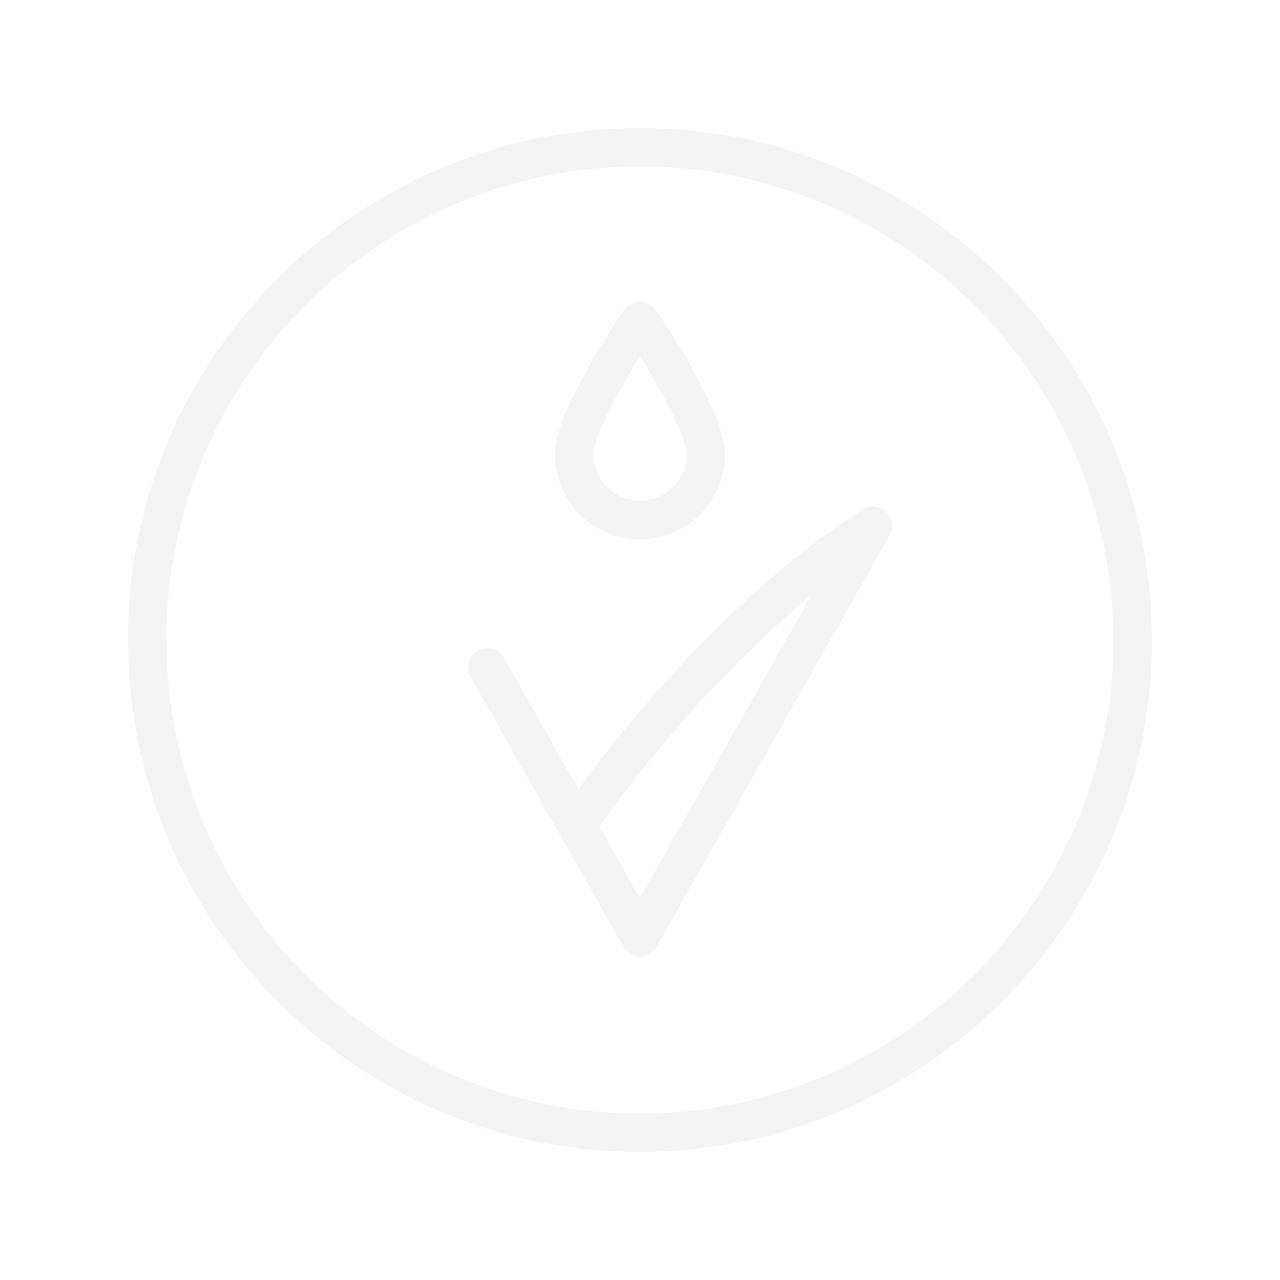 THEBALM Bonnie-Lou Manizer Highlighter & Shadow 9g